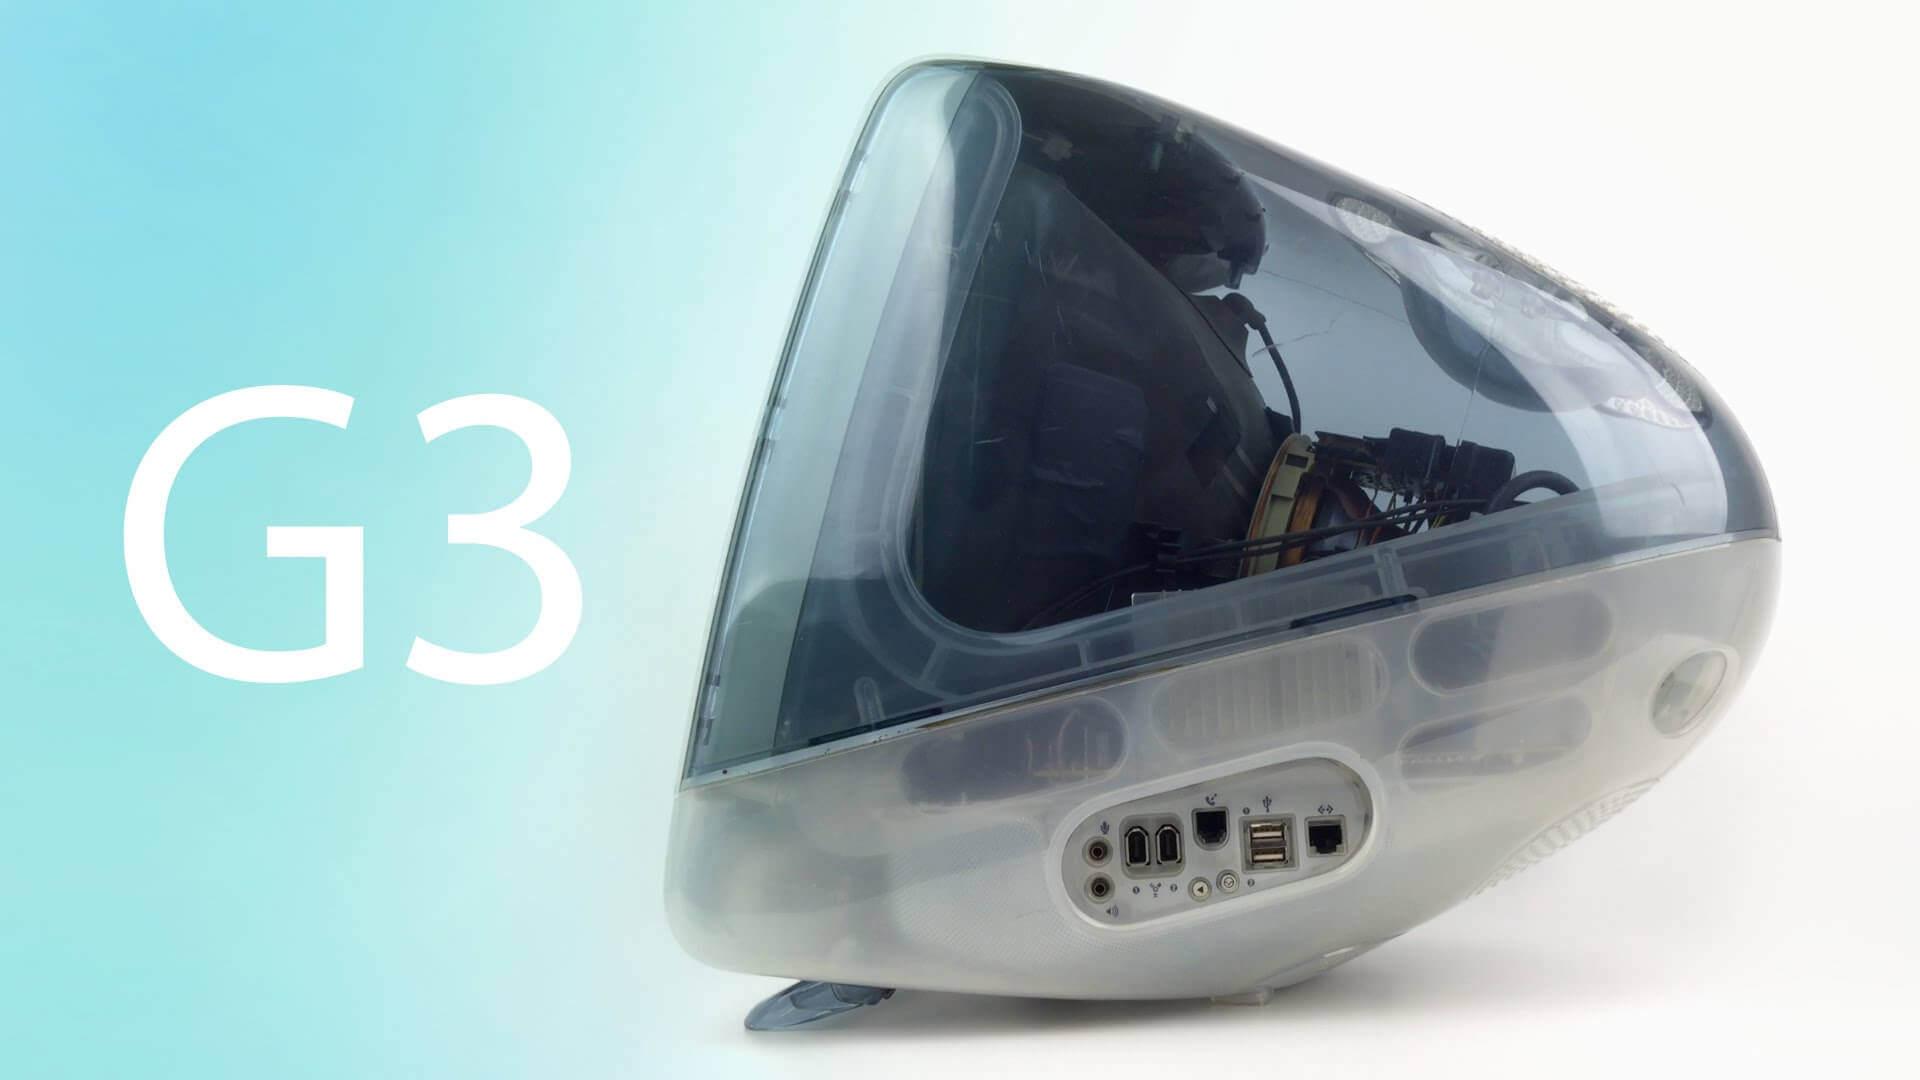 iMac G3 USB